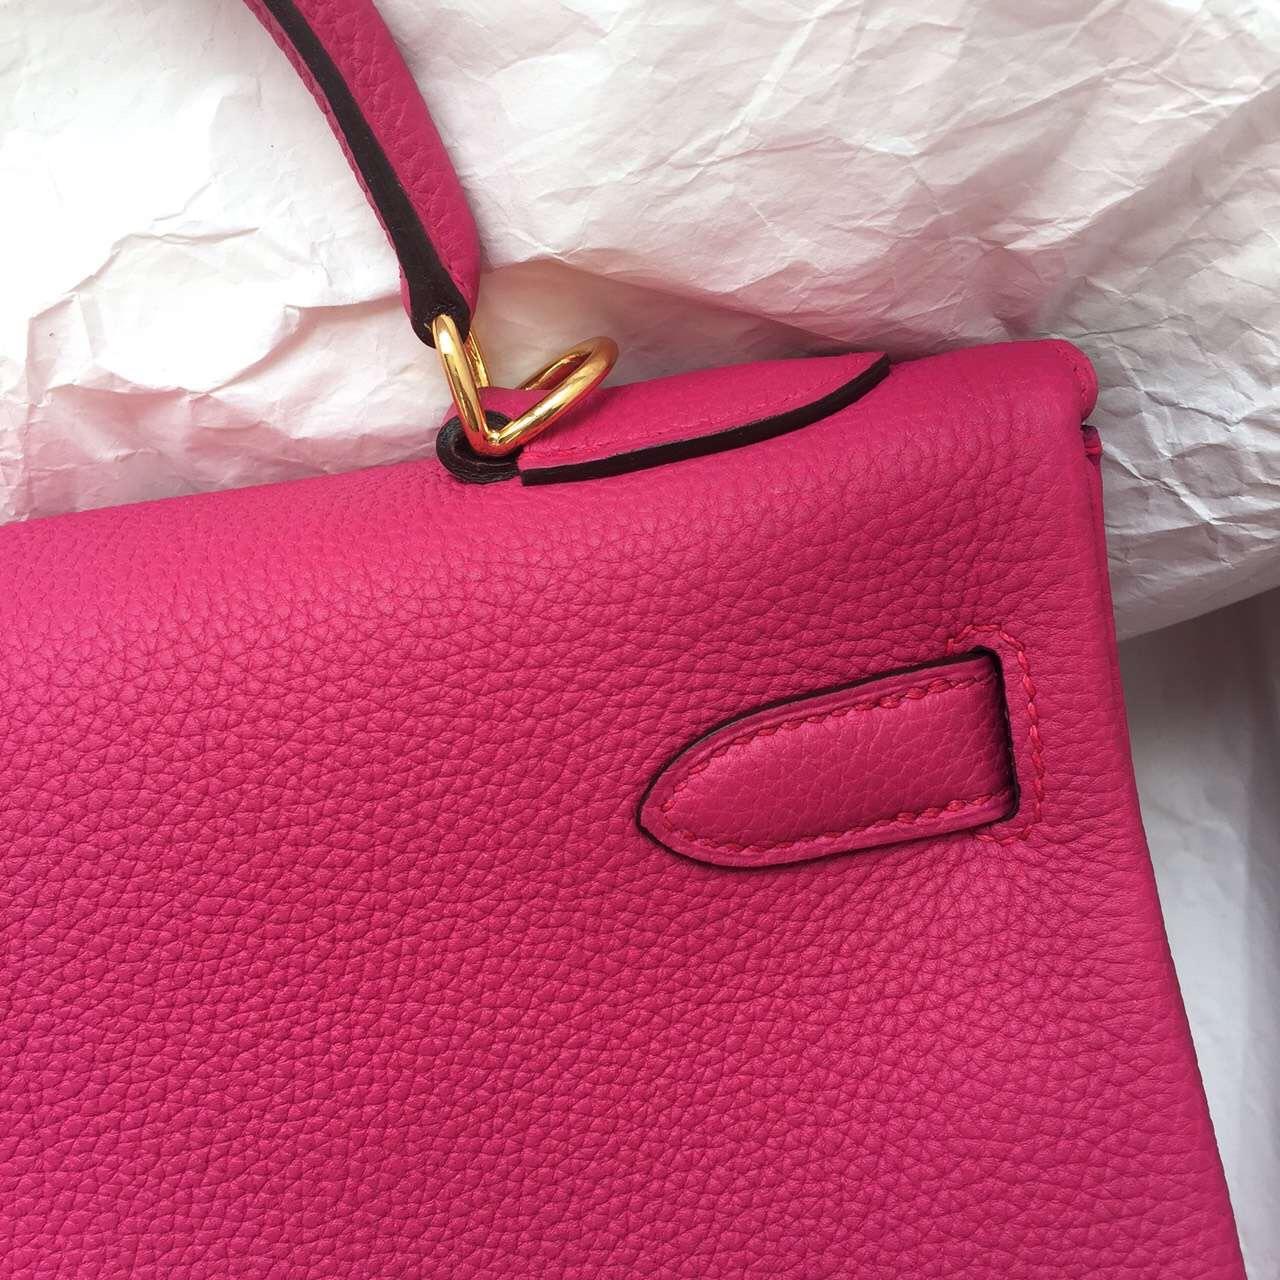 Wholesale Hermes 5R Hot Pink Togo Leather Retourne Kelly32 Gold Hardware